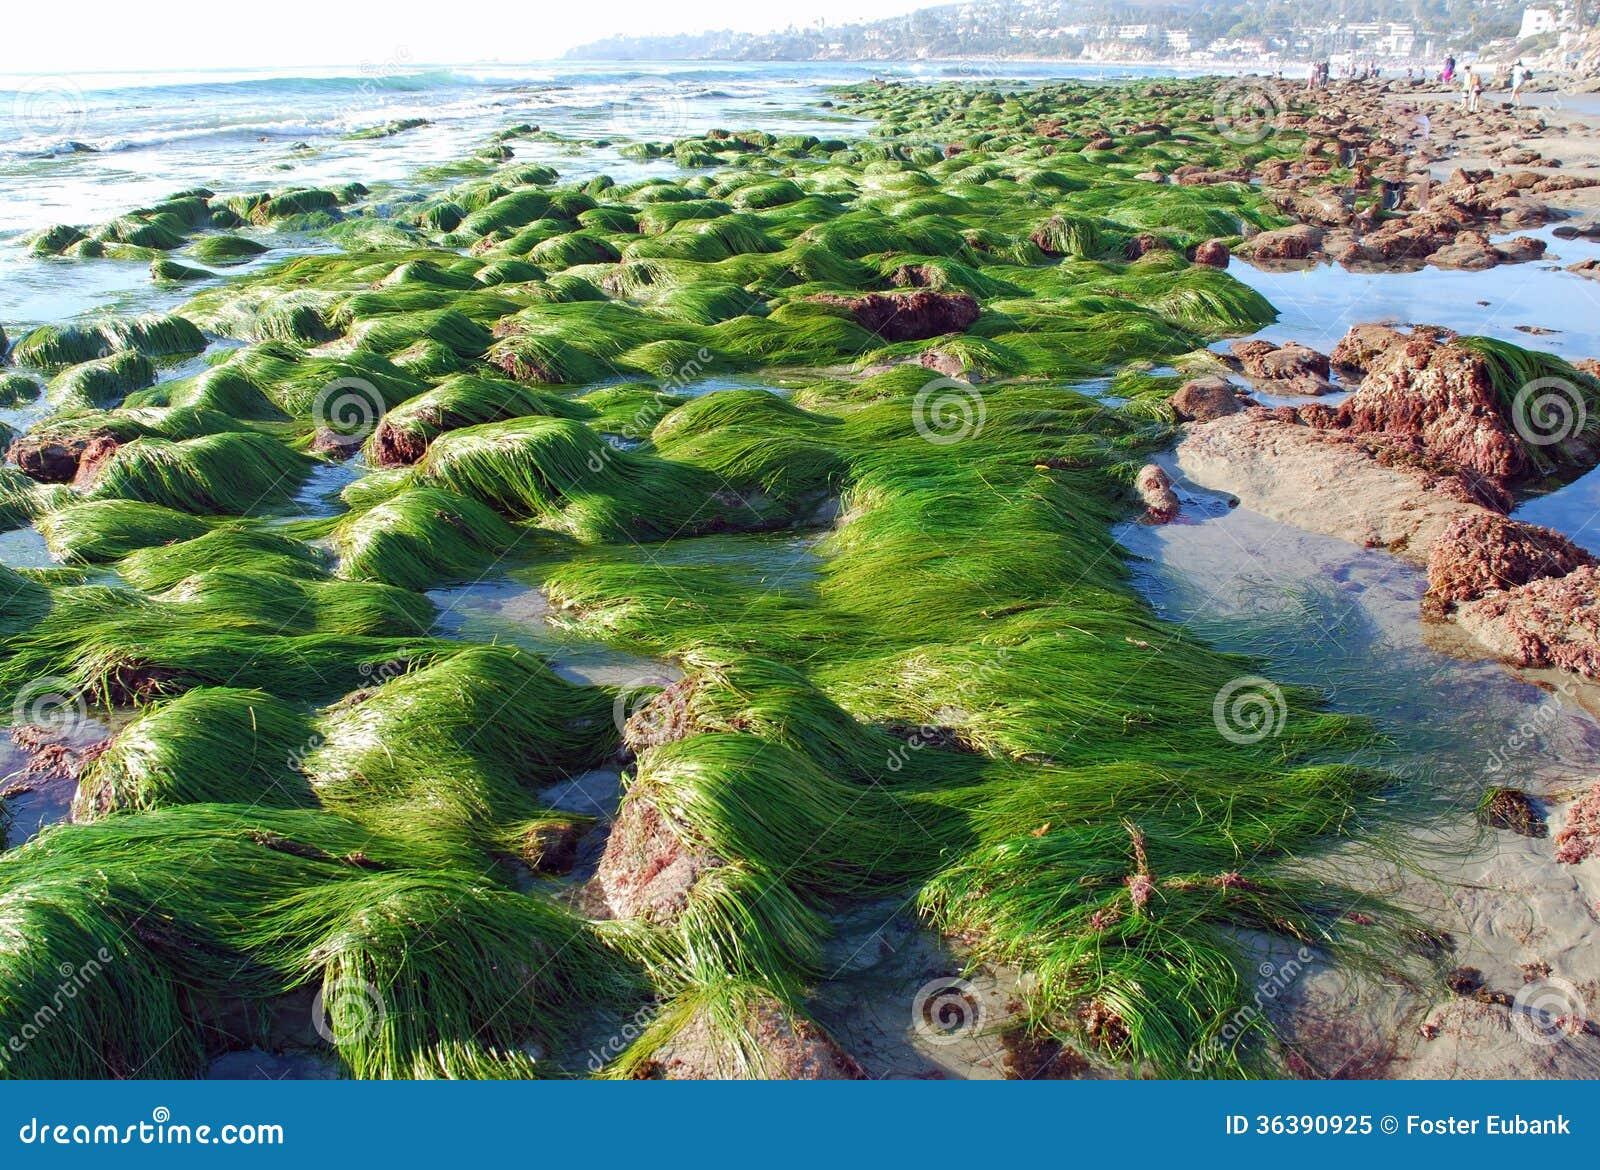 laguna beach dating site Talan torriero news,  talan torriero dating history, 2018, 2017, list of talan torriero  1986 in orange county, california, he is famous for laguna beach.